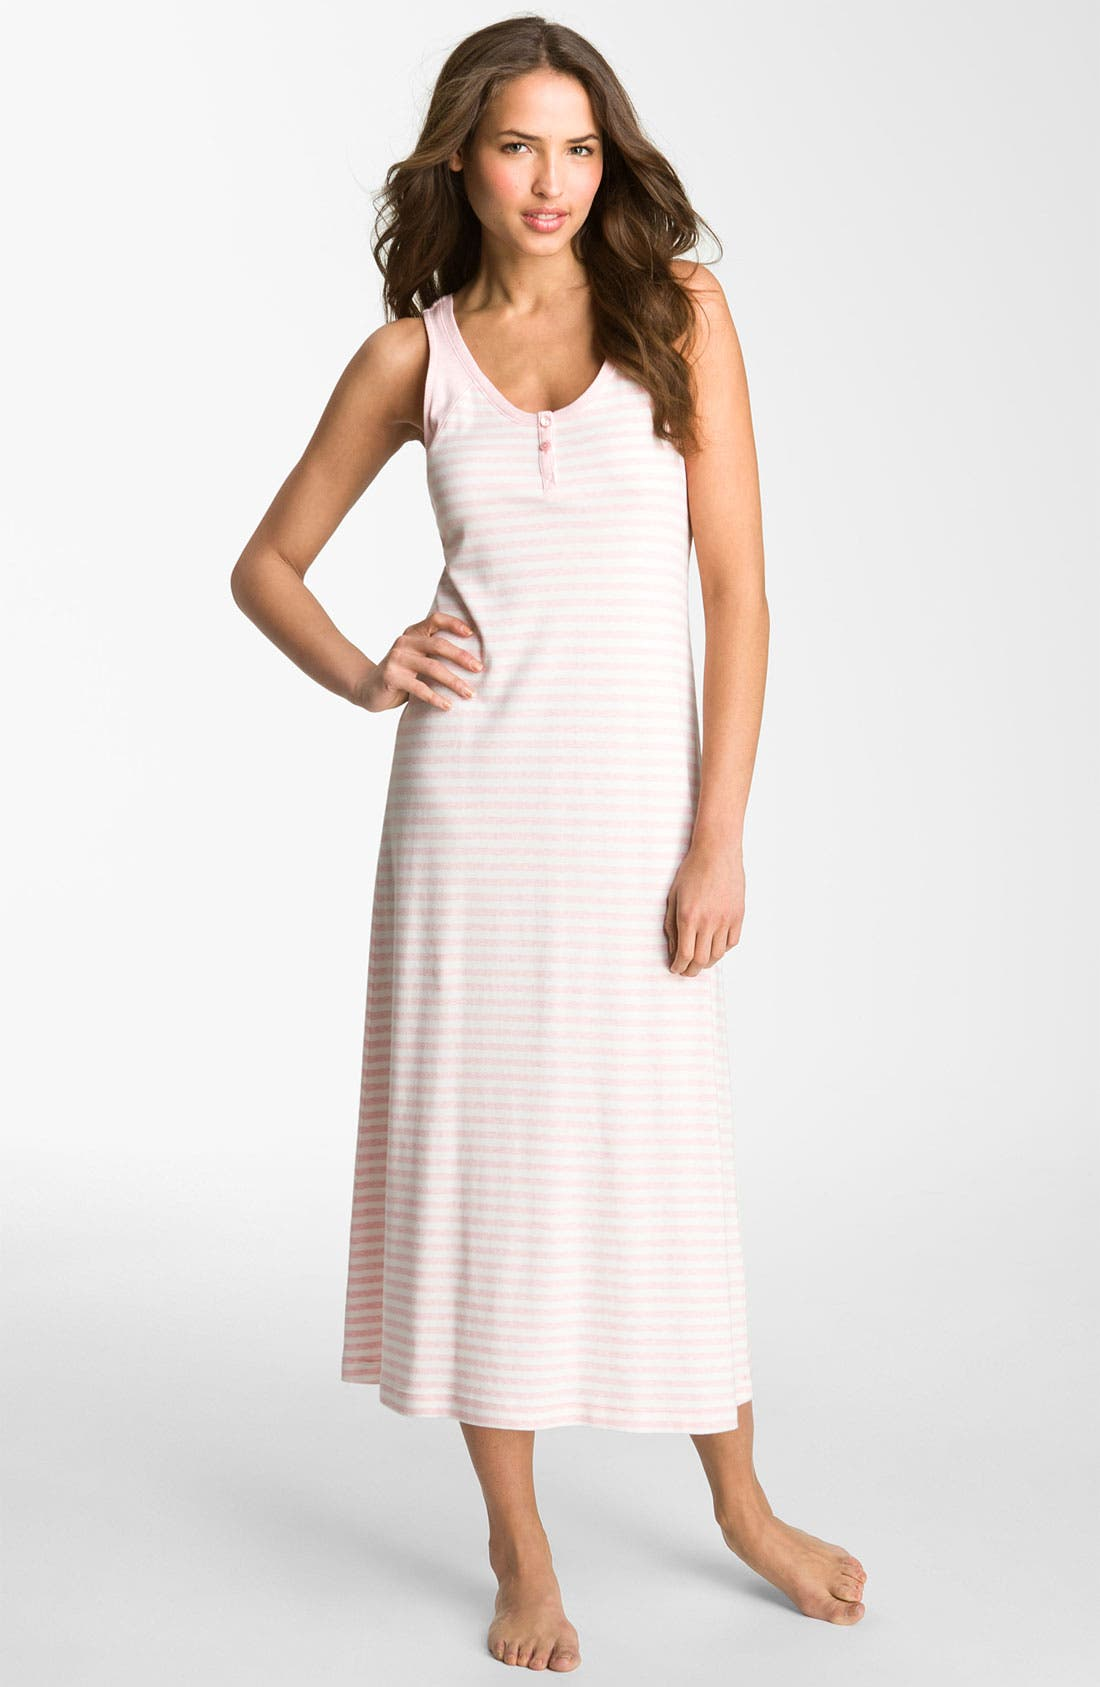 Main Image - Carole Hochman Designs 'Gardenside' Nightgown